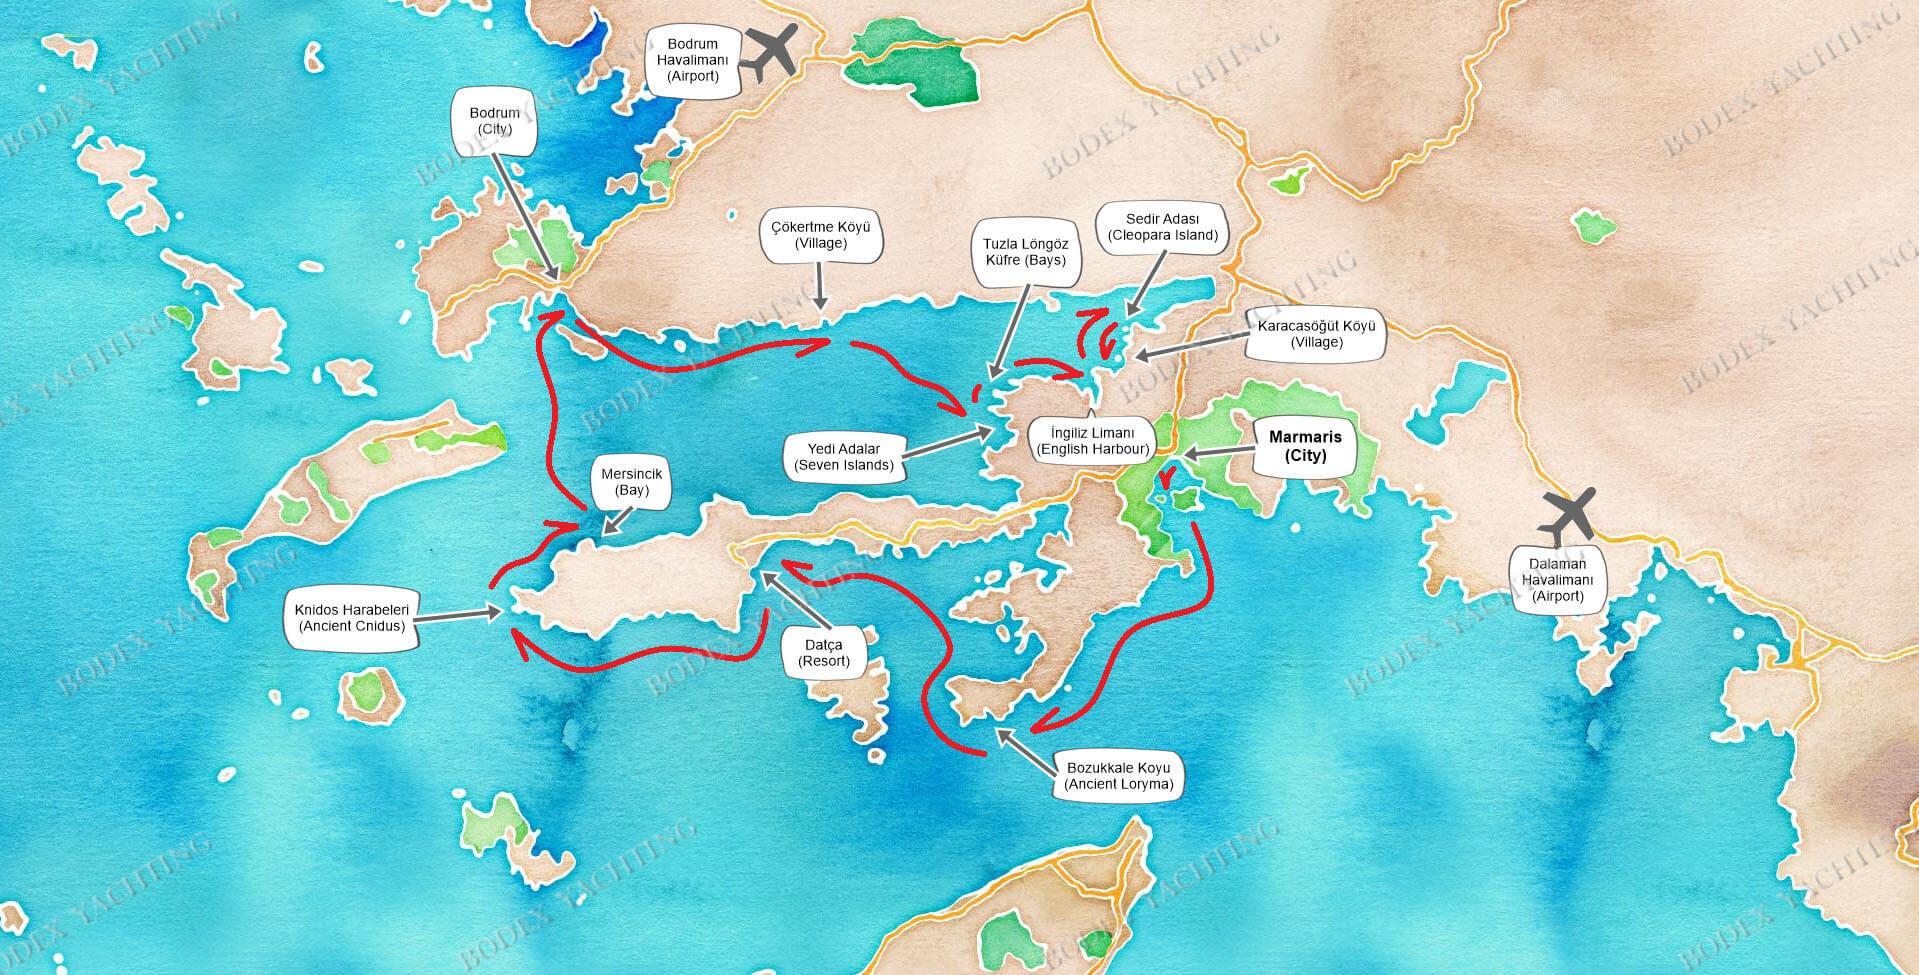 PRIVATE Charter Marmaris-Bodrum-Karacasogut